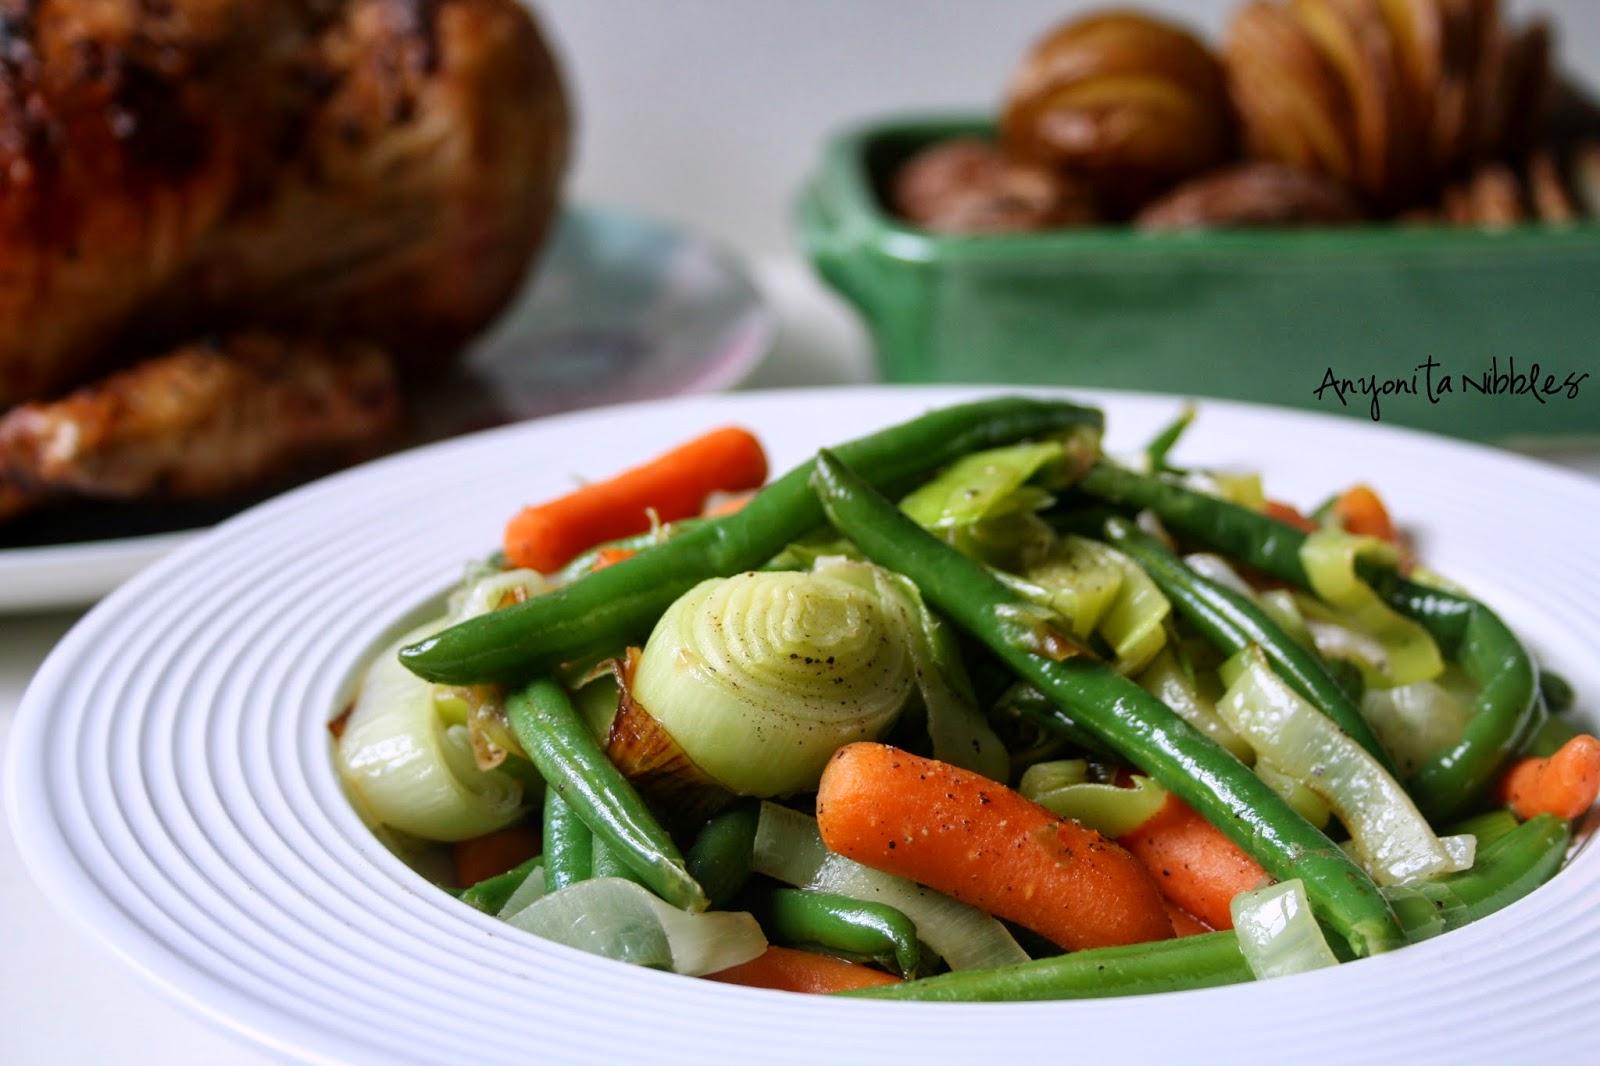 Anyonita Nibbles Gluten Free Recipes Easy Amp Impressive